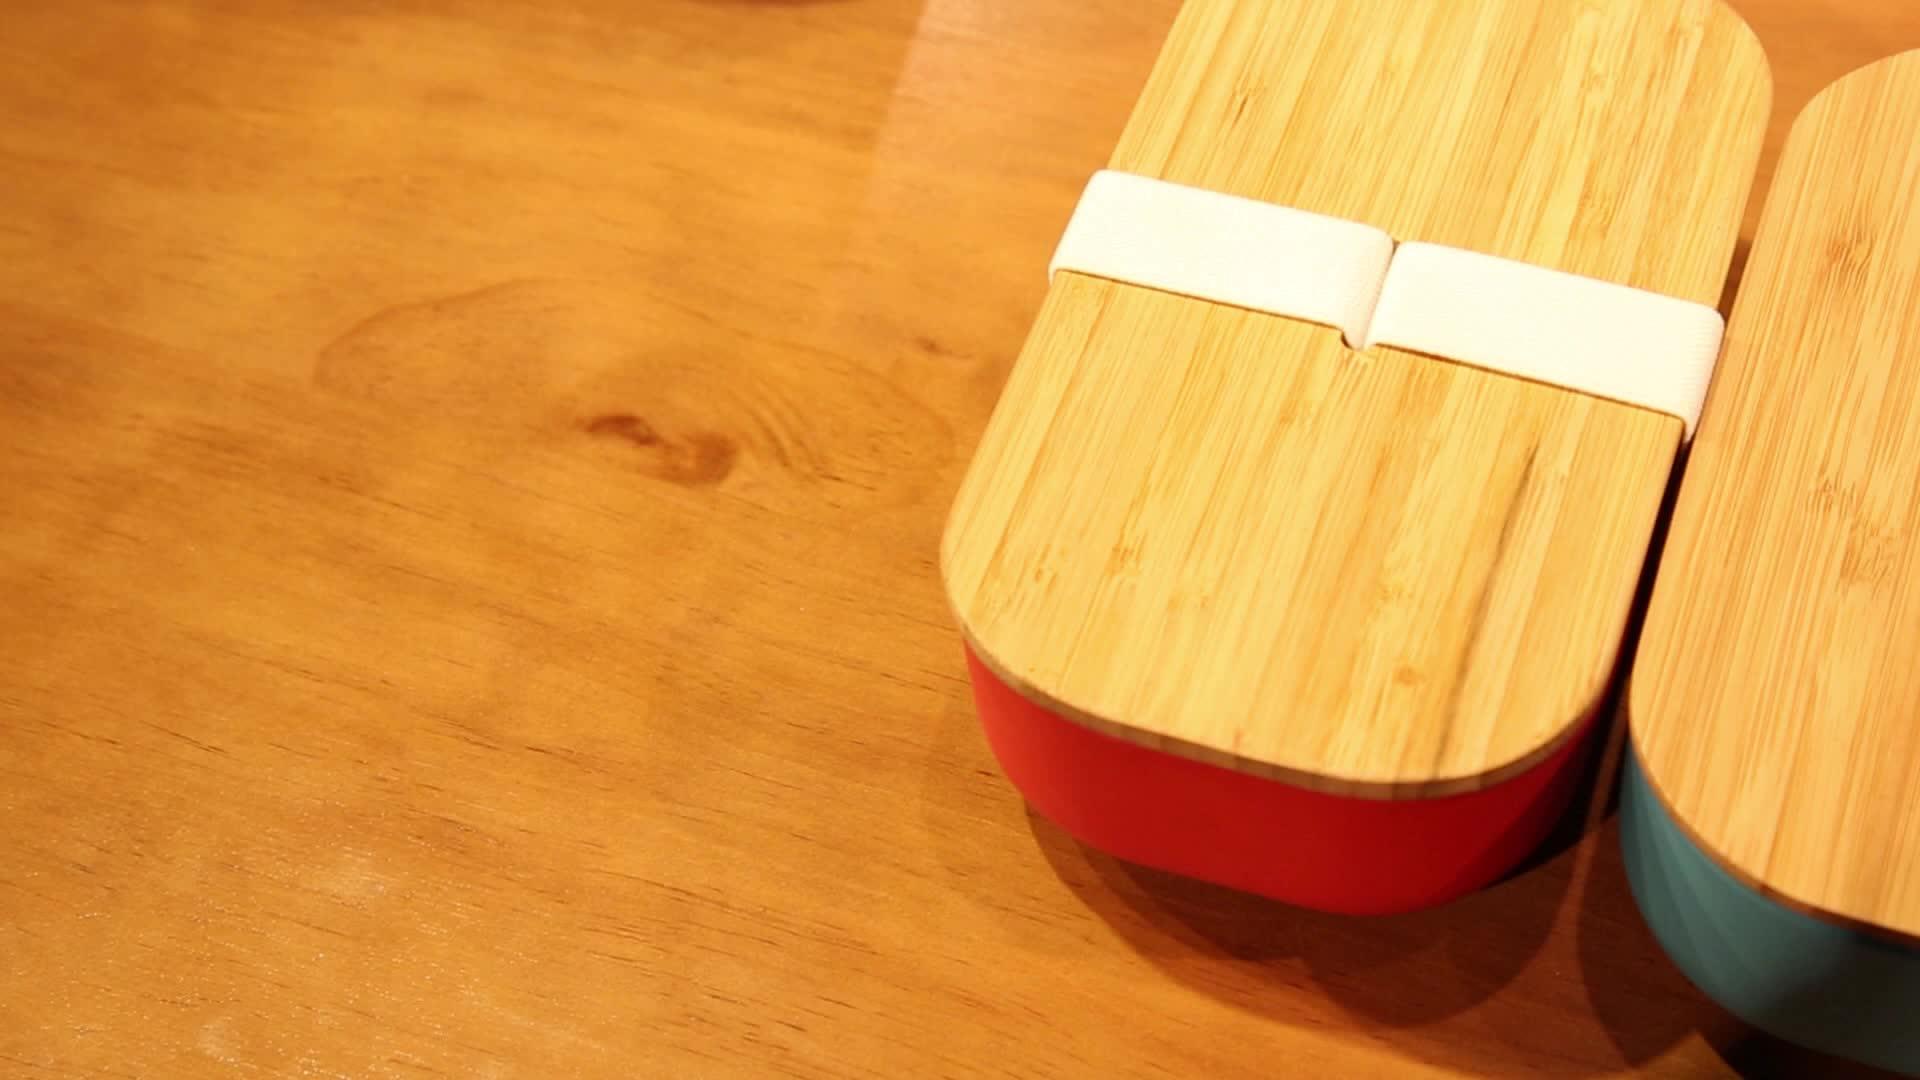 Custom Lekvrij Milieuvriendelijke BPA Gratis Niet Giftig FDA Goedgekeurd Bamboe Fibre Bento Lunchbox met bamboe deksel